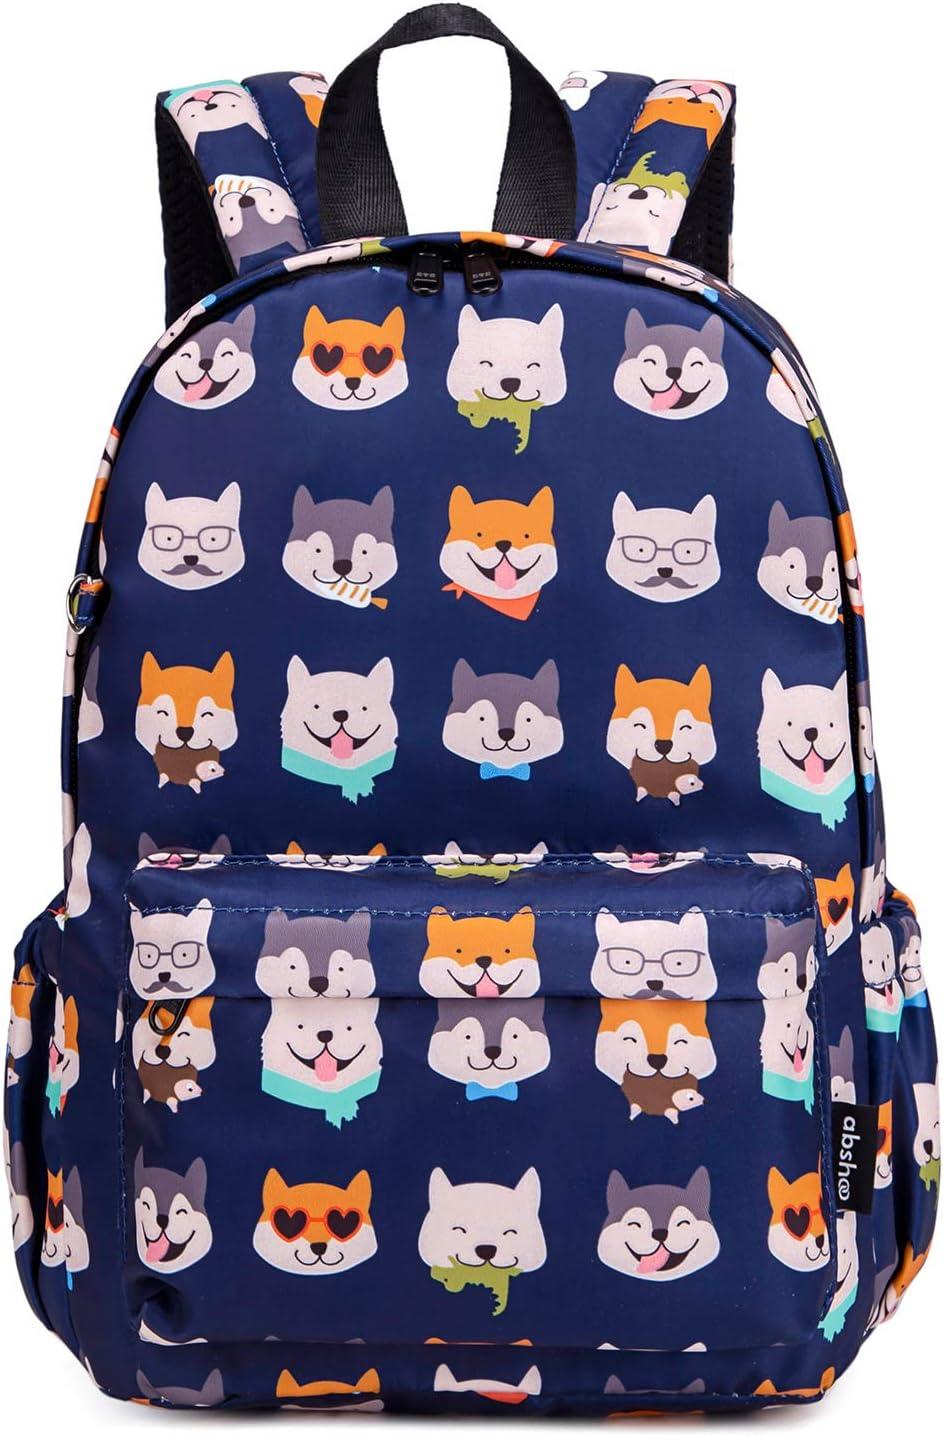 Abshoo Little Kids Toddler Backpacks for Preschool Backpack With Chest Strap (Husky Dog Navy)